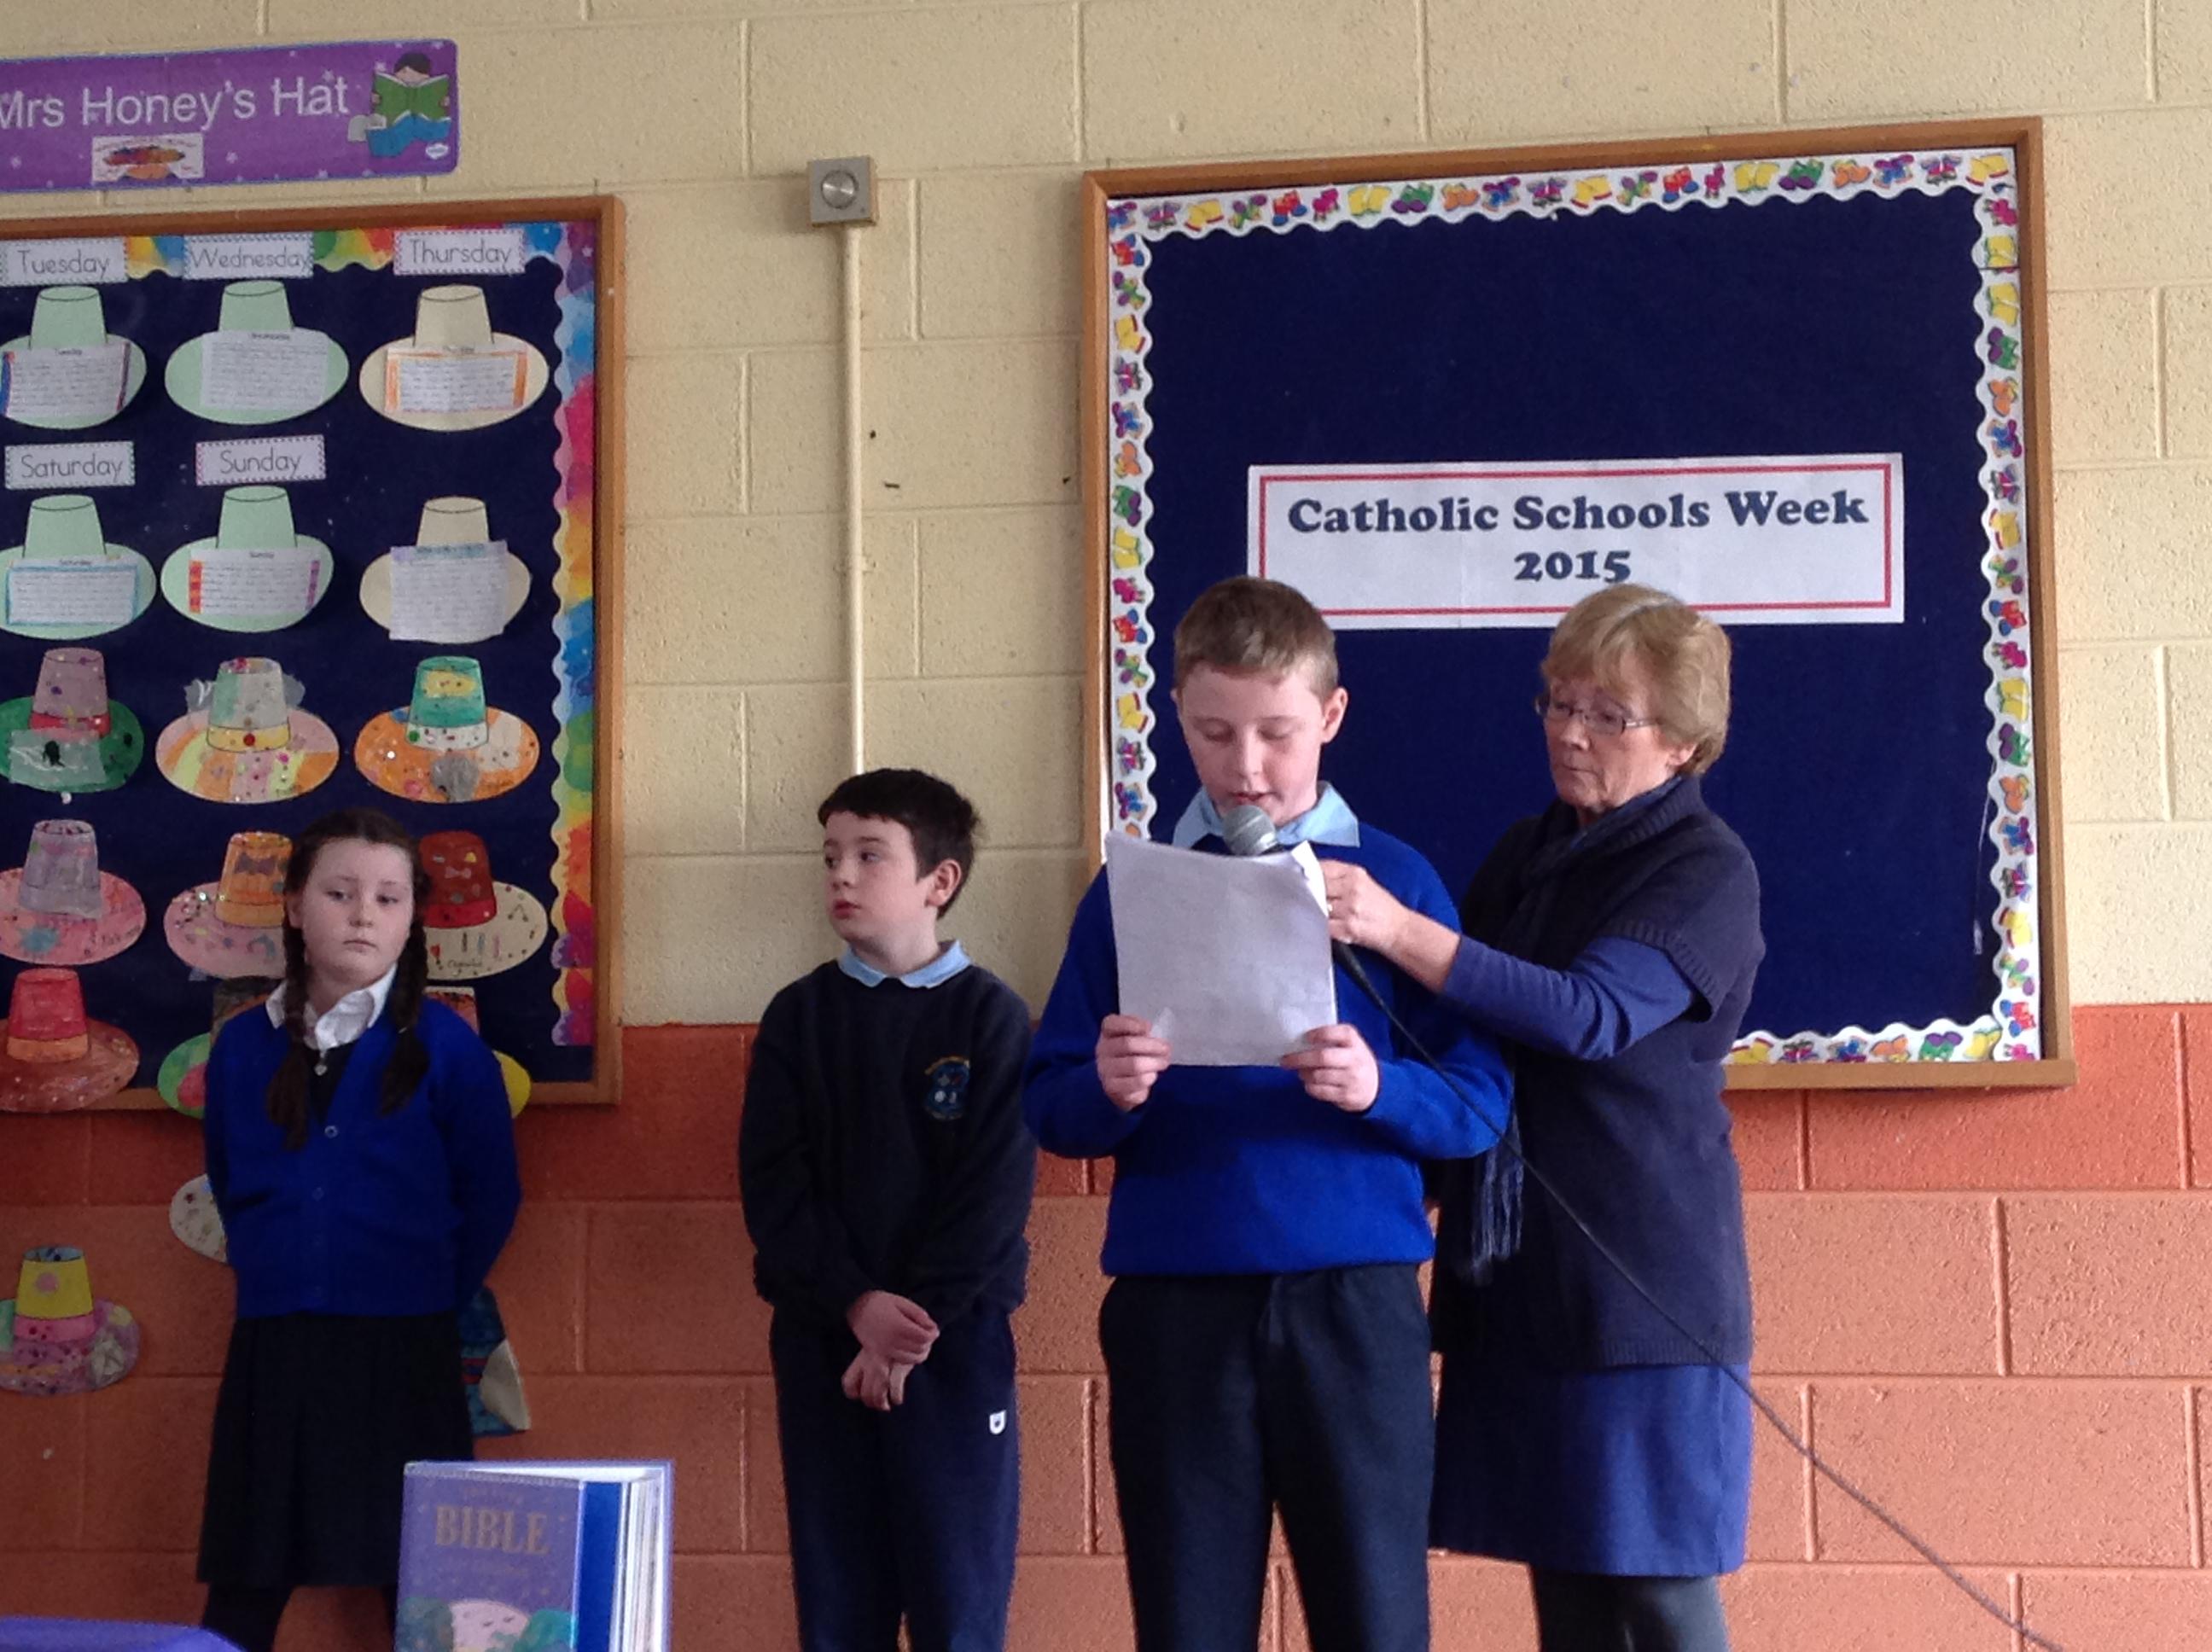 Prayer Service at begining of Catholic Schools Week